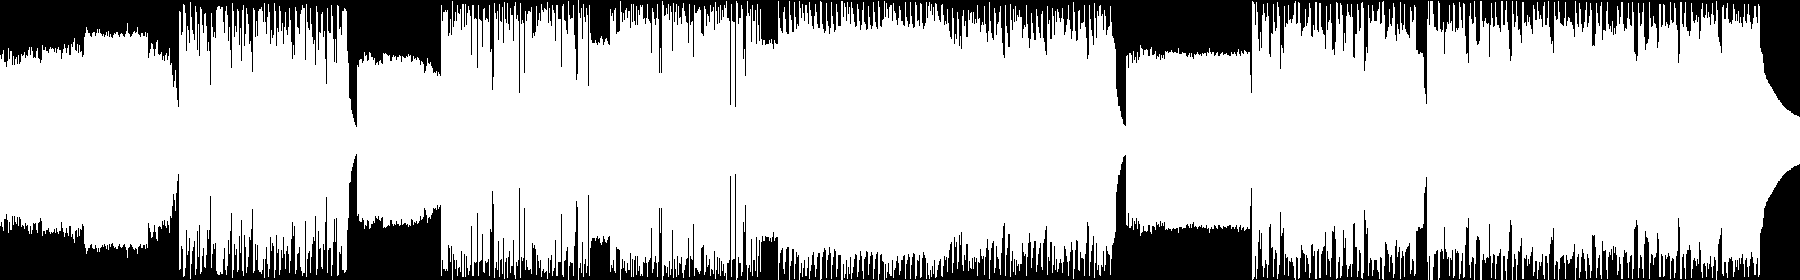 Dubstep and Glitch Hop audio waveform